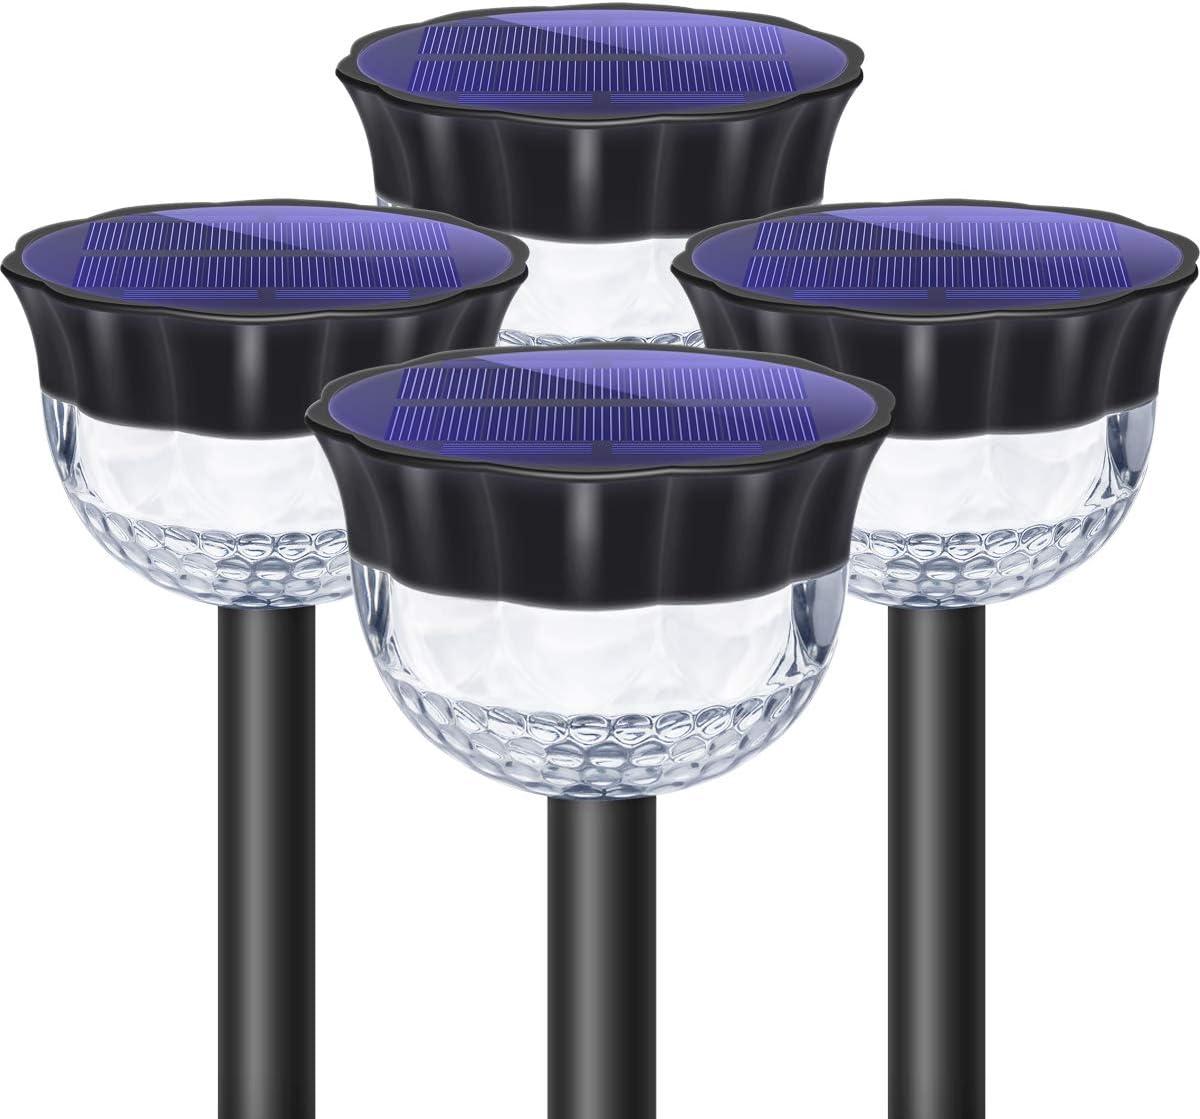 Solar Pathway Light Waterproof, Big Solar Charging Panel, Outdoor Solar Powered Garden Lights, 18 LEDs, Warm White Dock Light for Lawn, Yard, Walkway, Driveway, 4 Pack